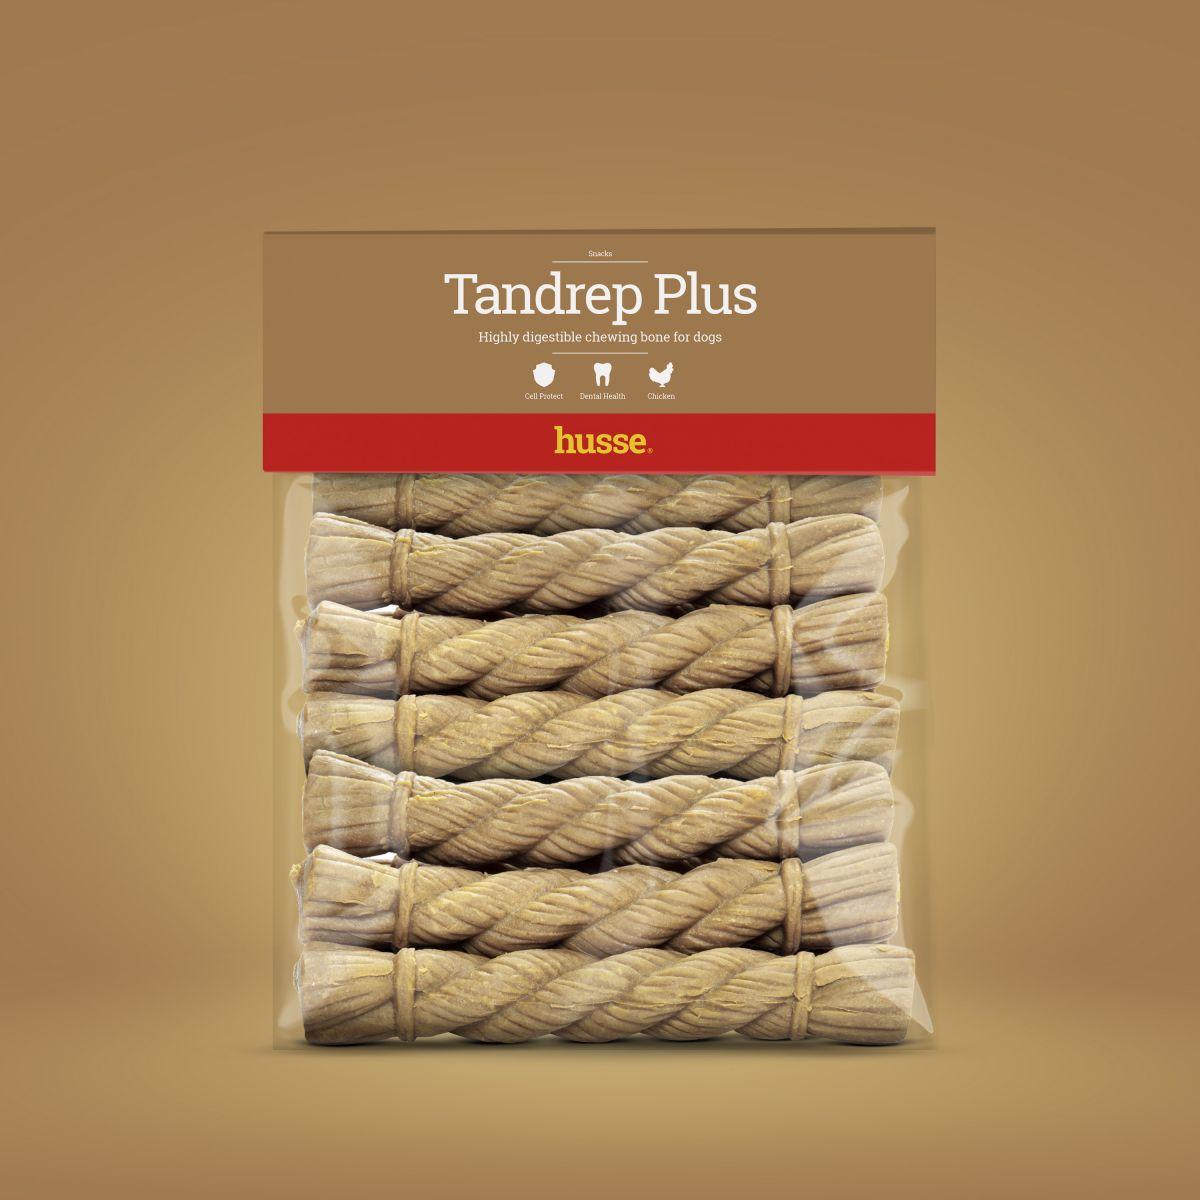 Tandrep